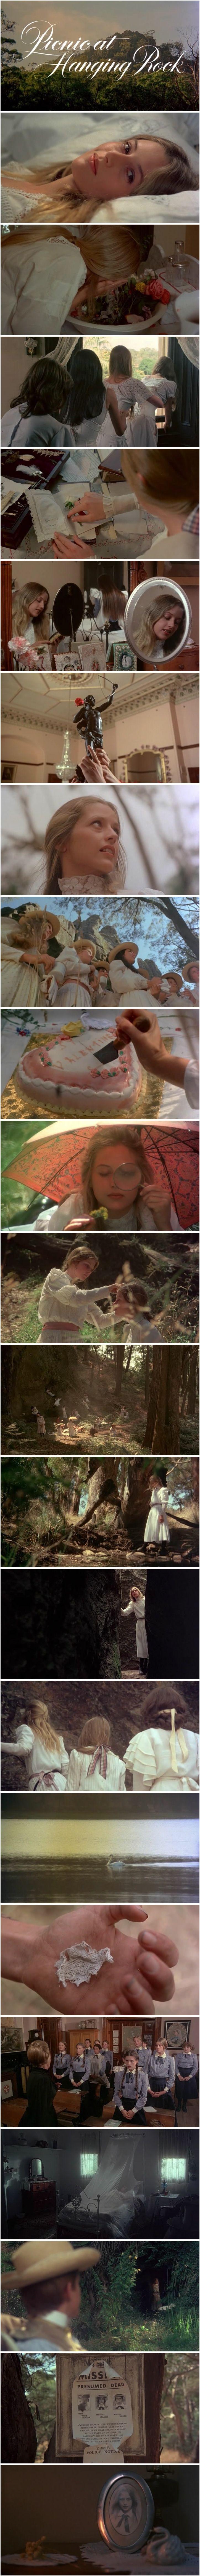 Peter Weir's Picnic At Hanging Rock (1975)